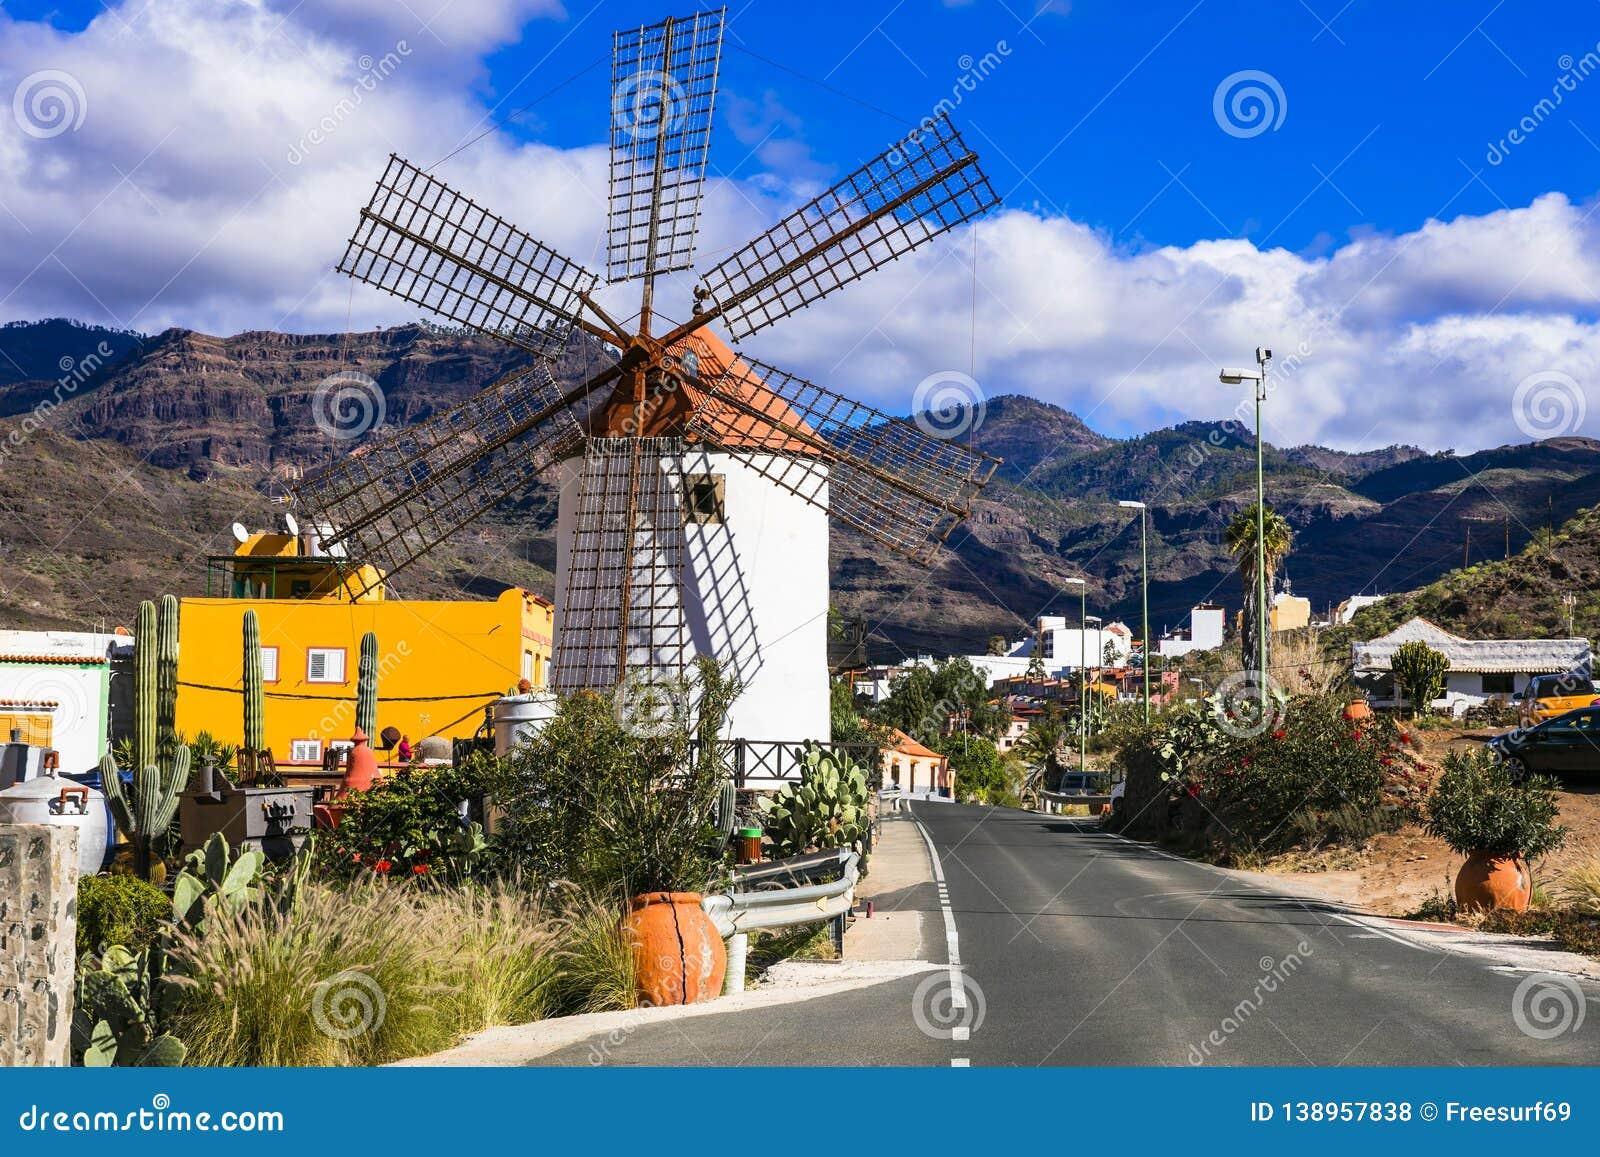 Traditional village and windmills of Canary island. Mogan, Gran Canaria